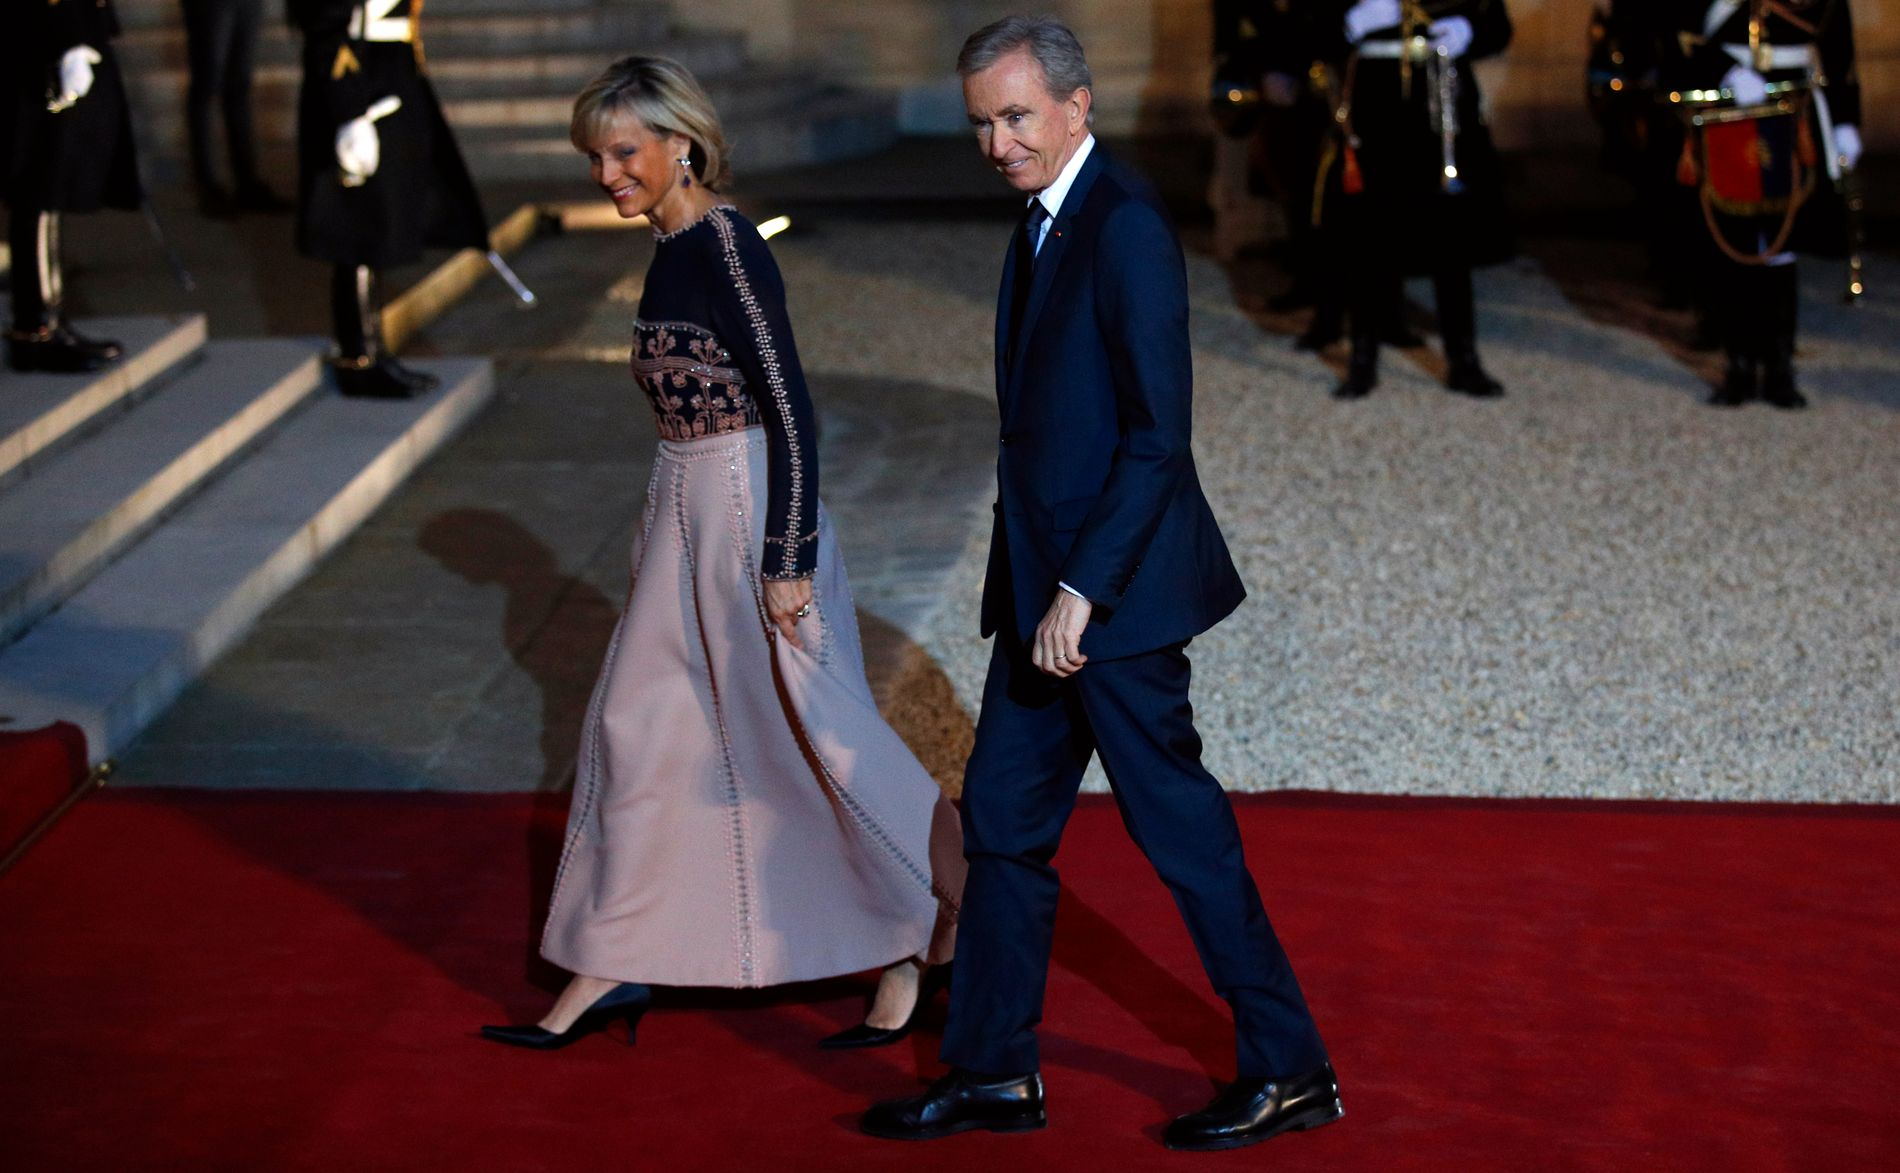 Bernard Arnault sammen med sin kone, pianisten Helene Mercier-Arnault, i anledning en gallamiddag ved presidentboligen Elysee-palasset i Paris.